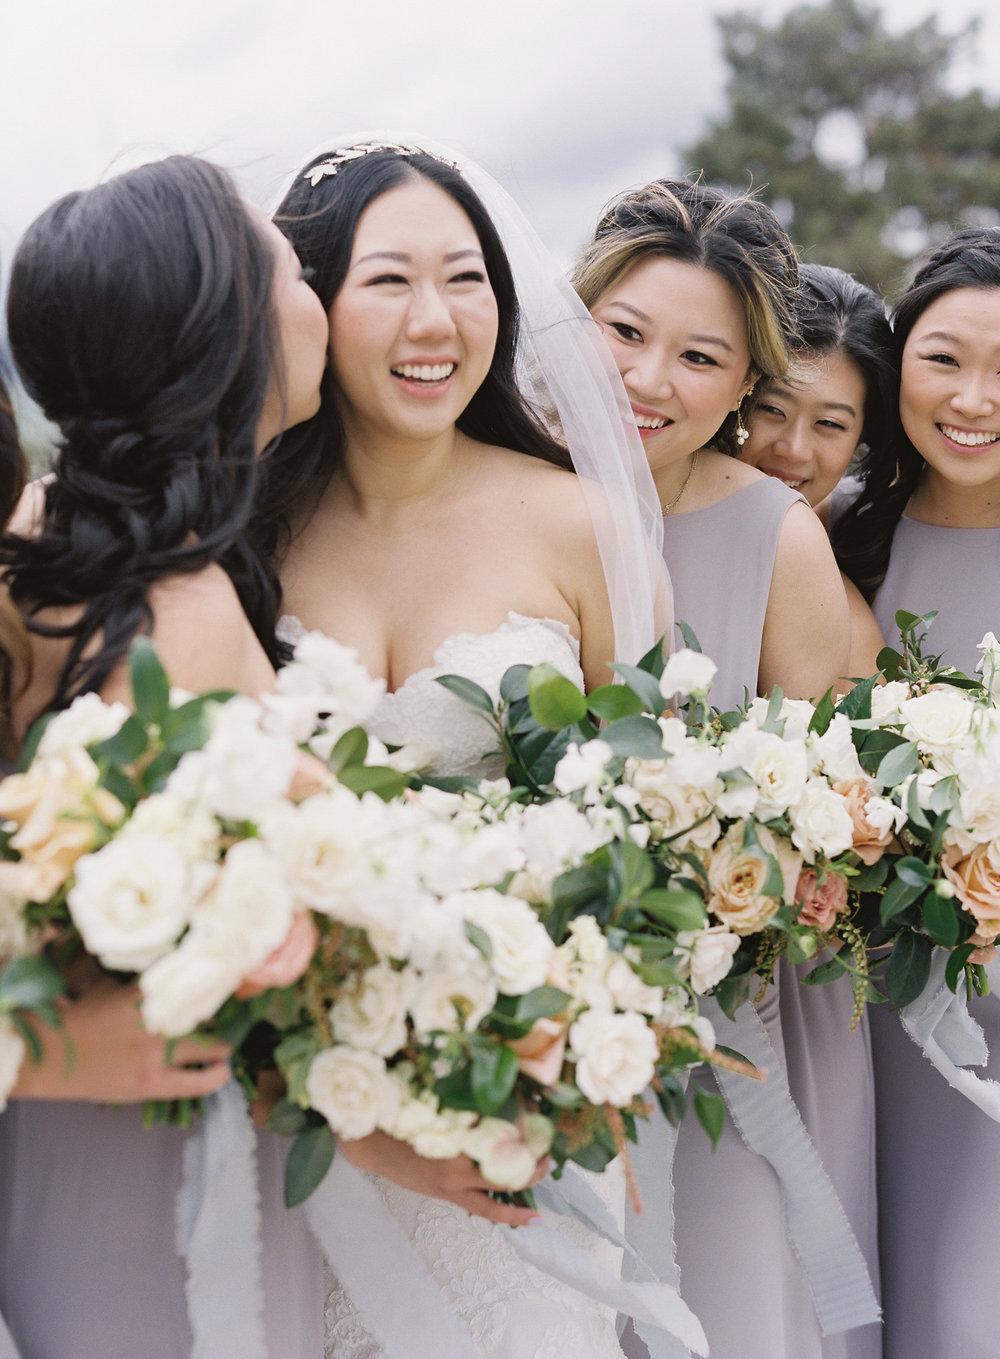 bridal_party15.jpg